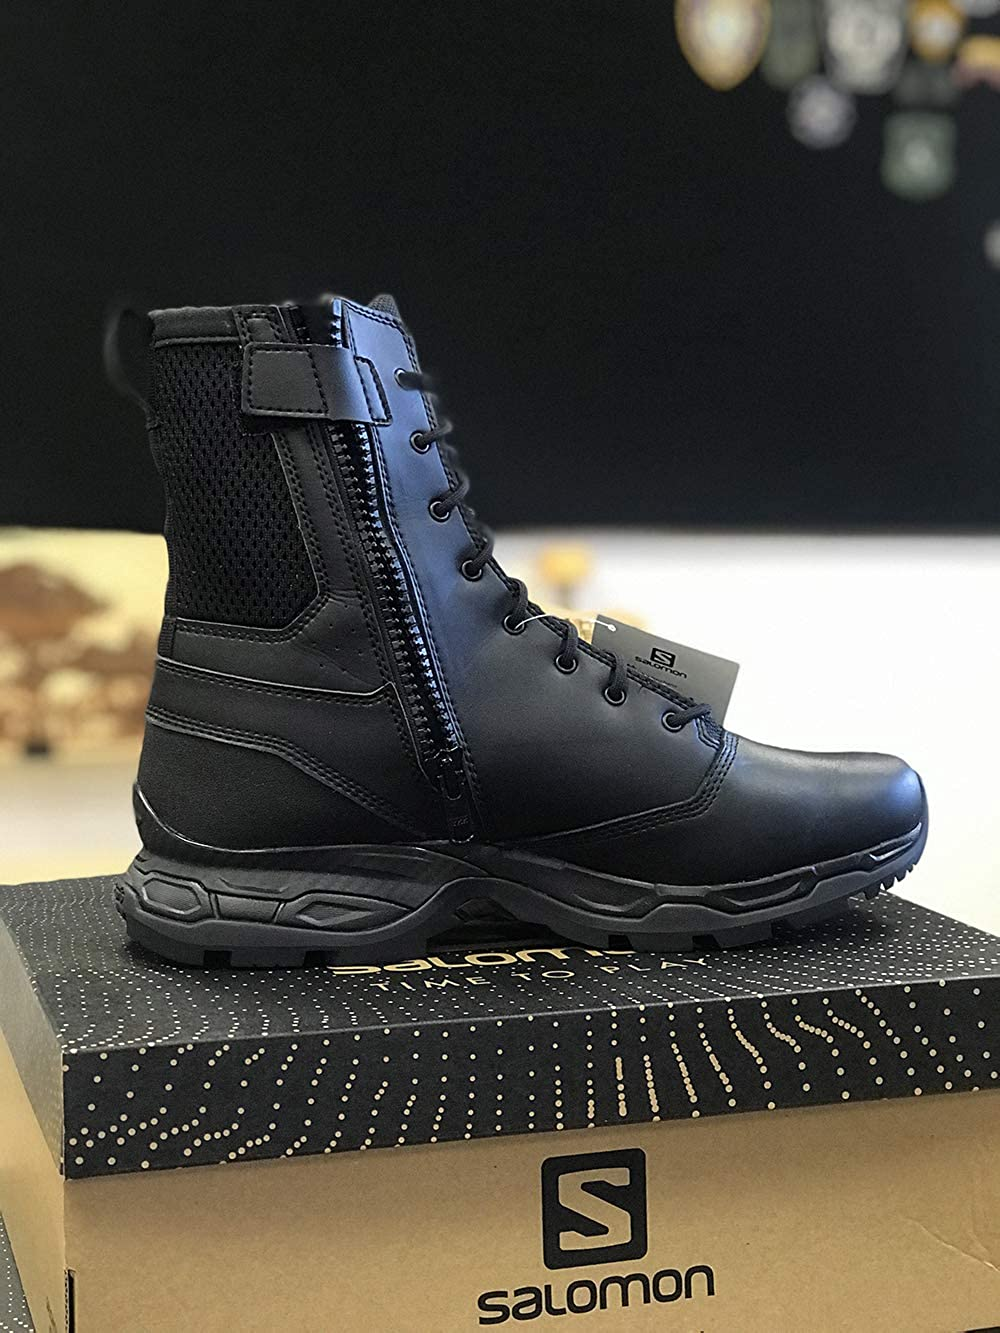 Salomon Urban Jungle Ultra Side Zip Boot